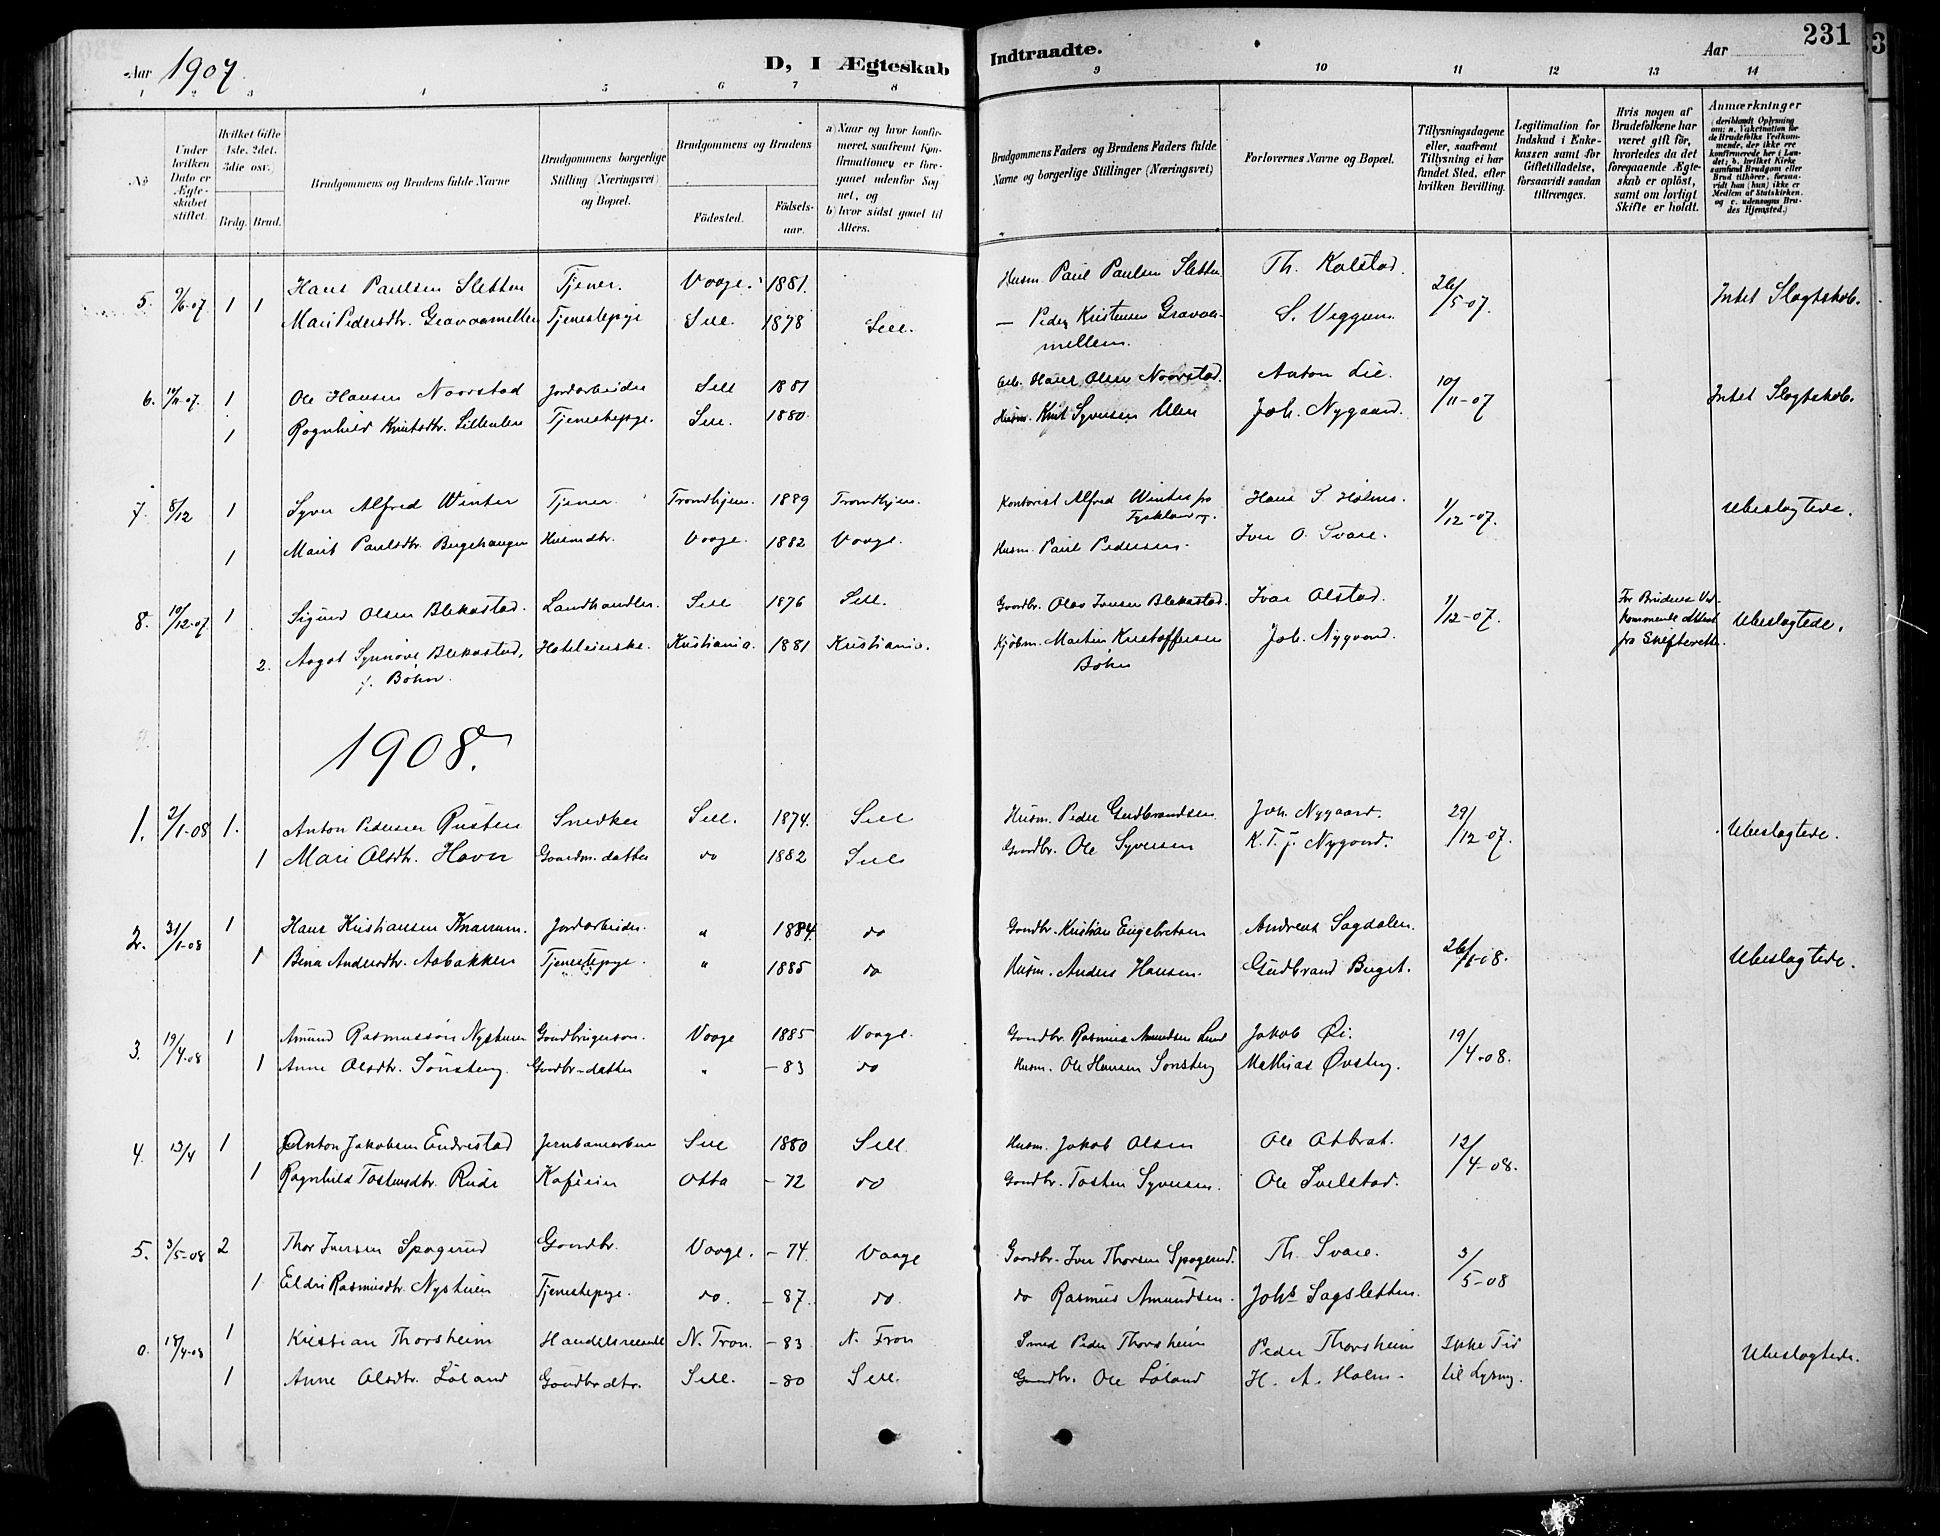 SAH, Sel prestekontor, Klokkerbok nr. 1, 1894-1923, s. 231